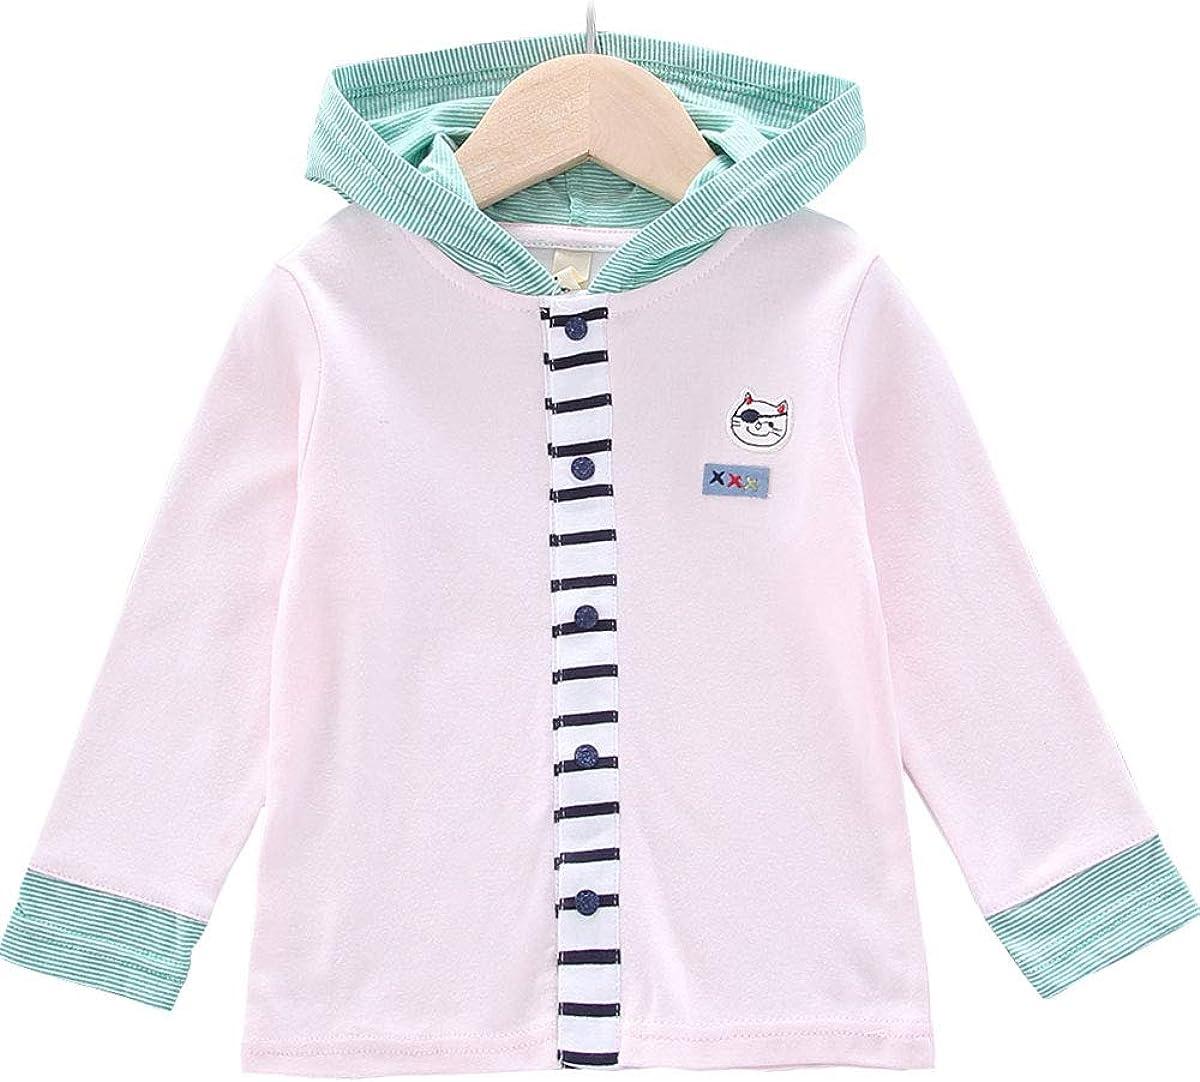 Ancia Baby Girls Toddler Kids Hoodie Coat Button Up Sweatshirt Jacket Long Sleeve T-Shirt